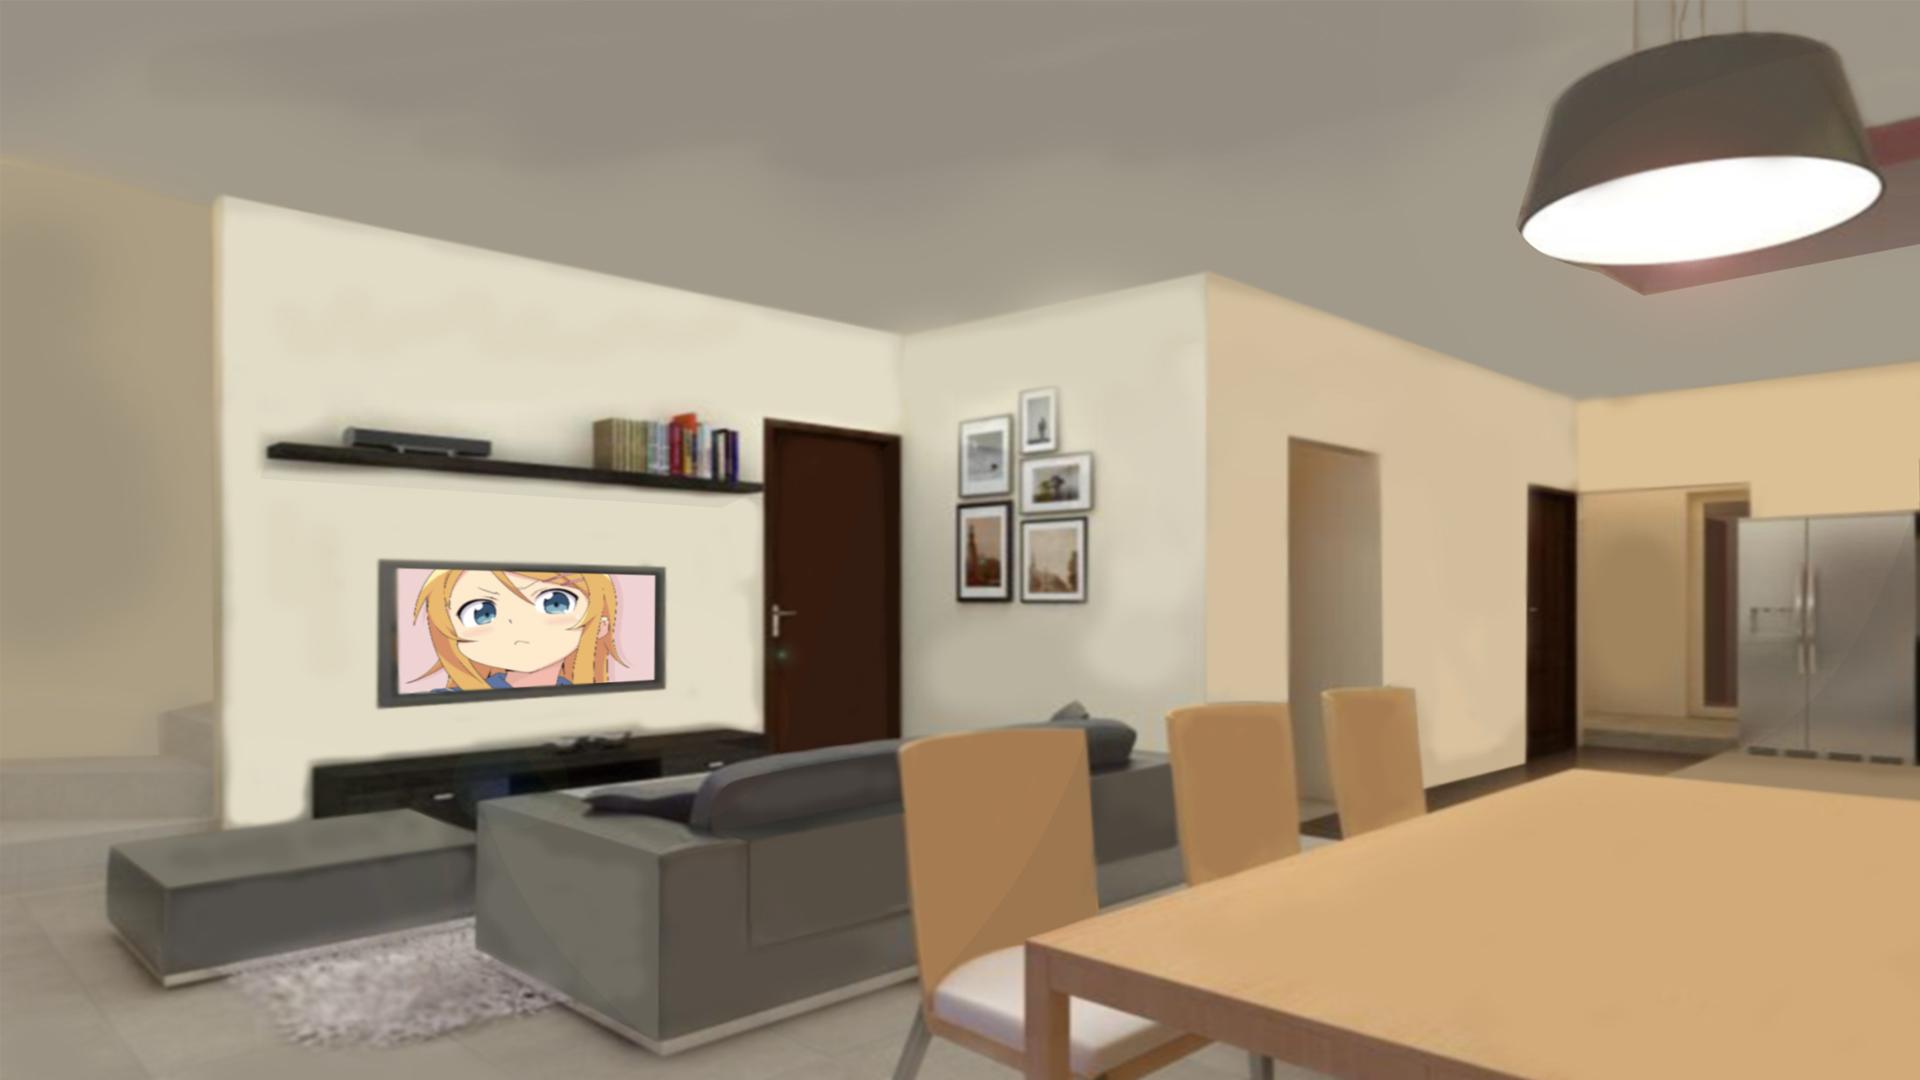 Living Room Background Anime